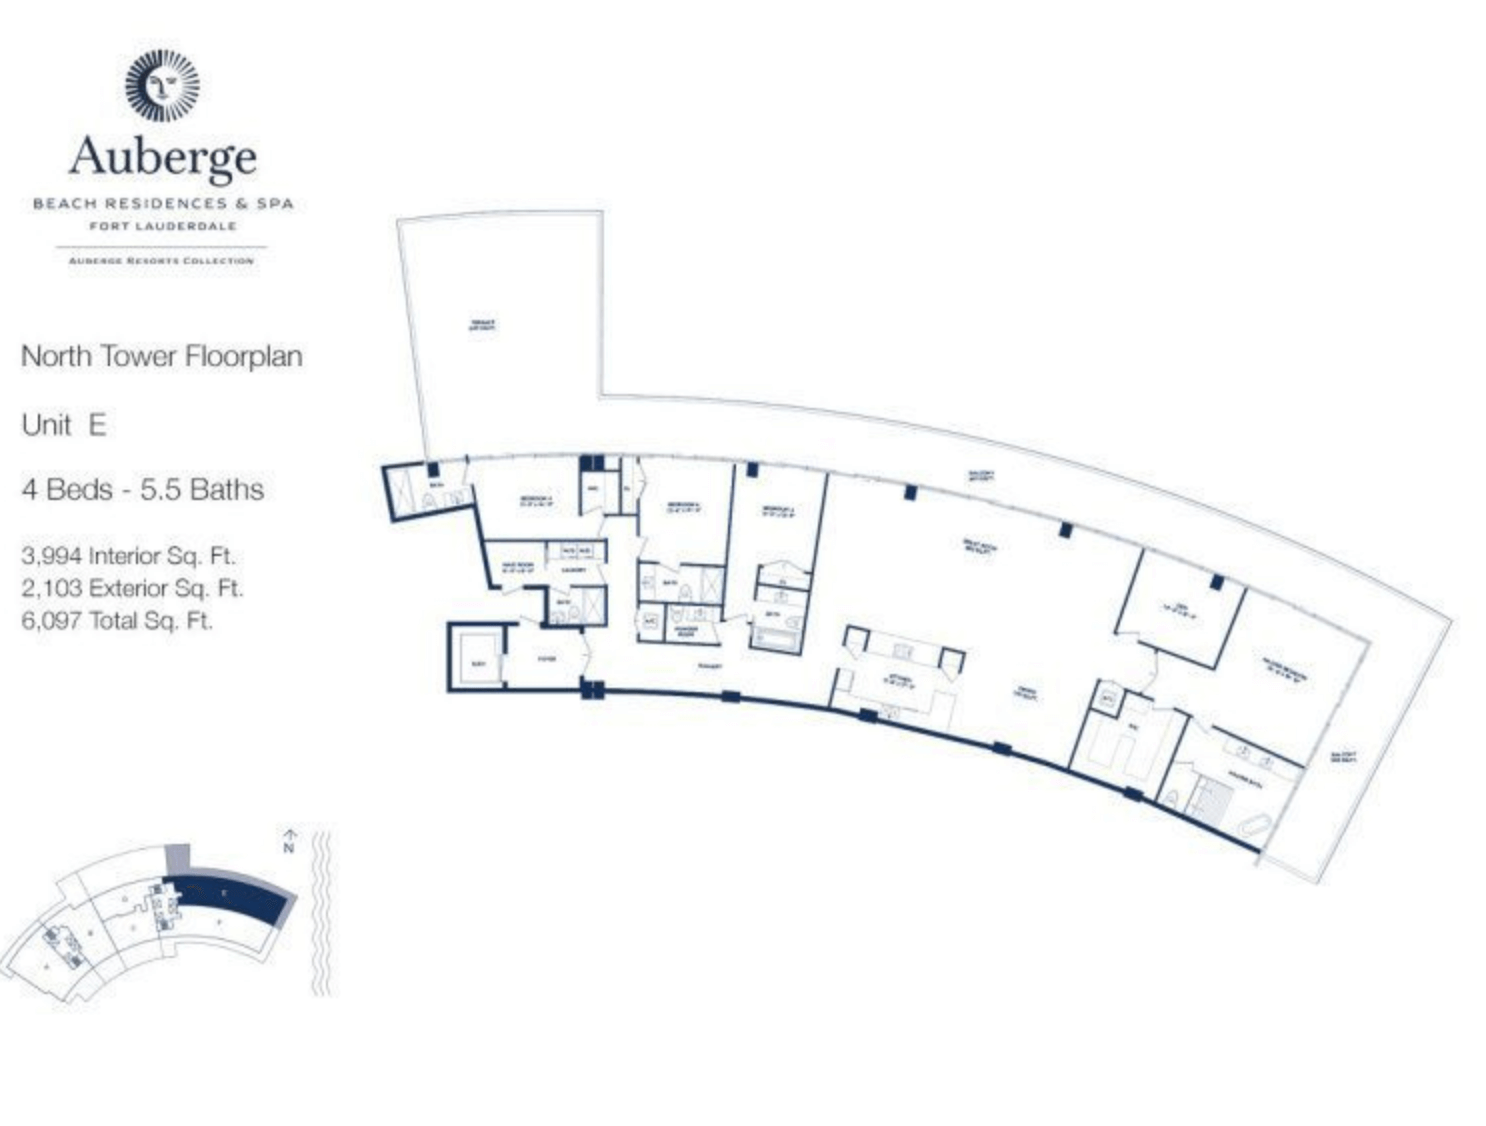 Auberge Beach Residences North Tower E | 4 Beds - 5.5 baths